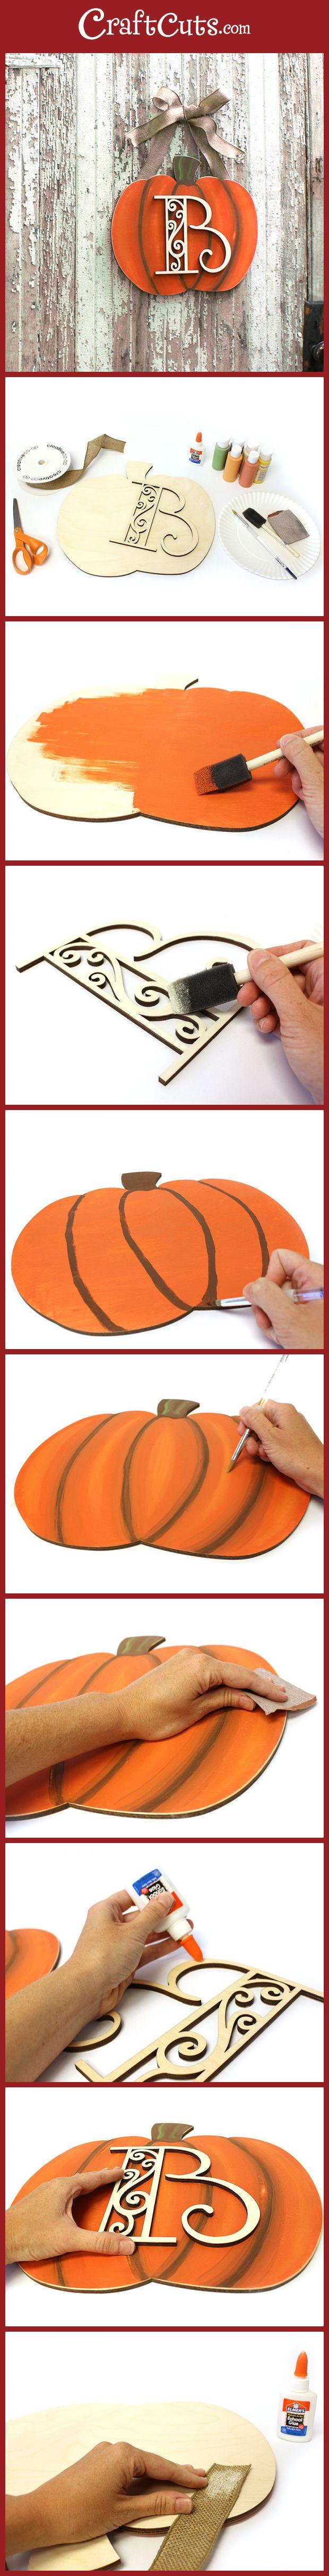 Best 25+ Diy fall crafts ideas on Pinterest | Fall crafts, Fall ...